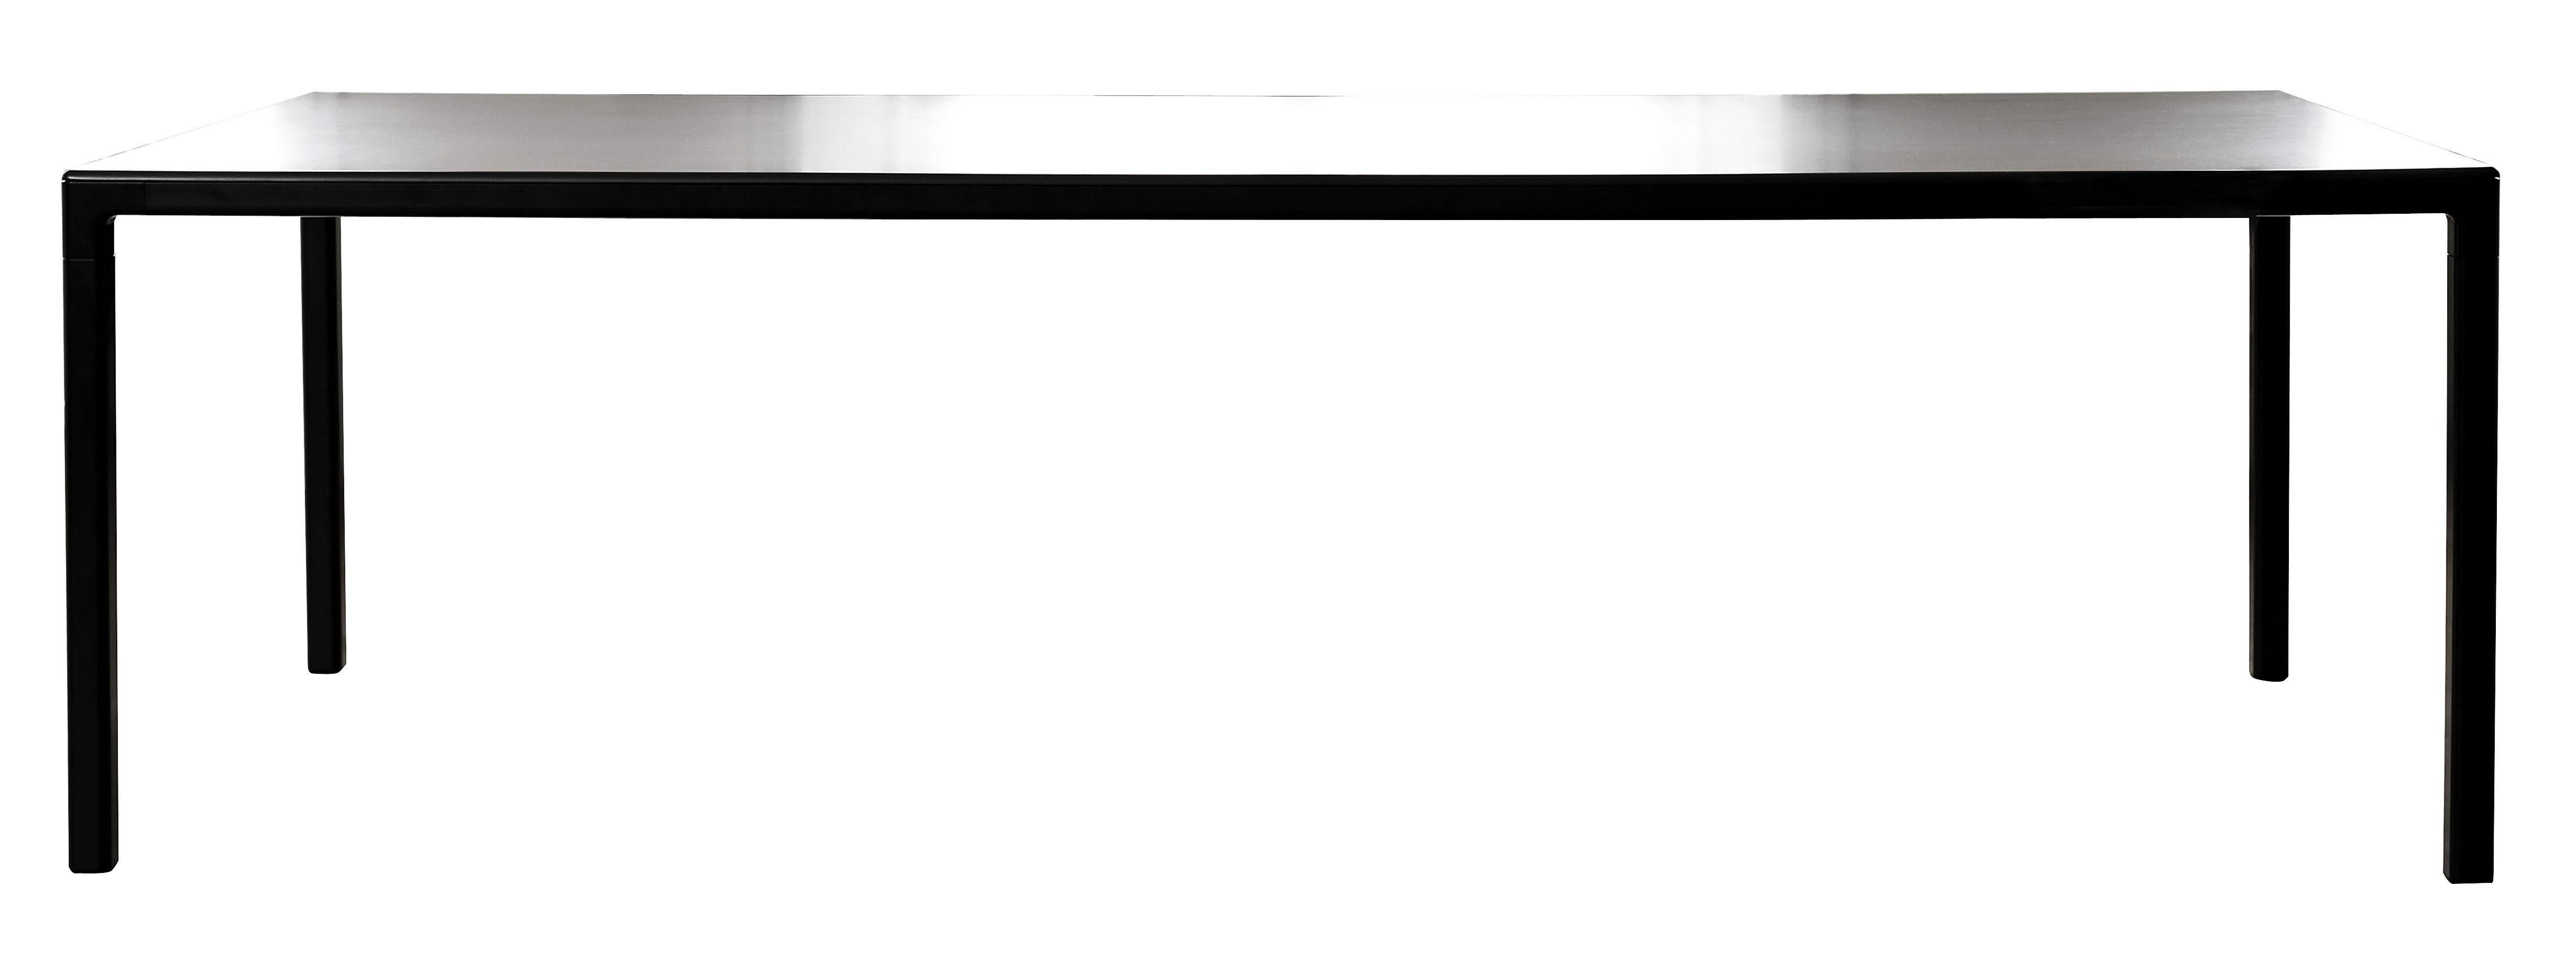 Möbel - Tische - T12 rechteckiger Tisch rechteckig - 160 x 80 cm - Hay - 160 x 80 cm - schwarz - bemaltes Aluminium, Linoleum